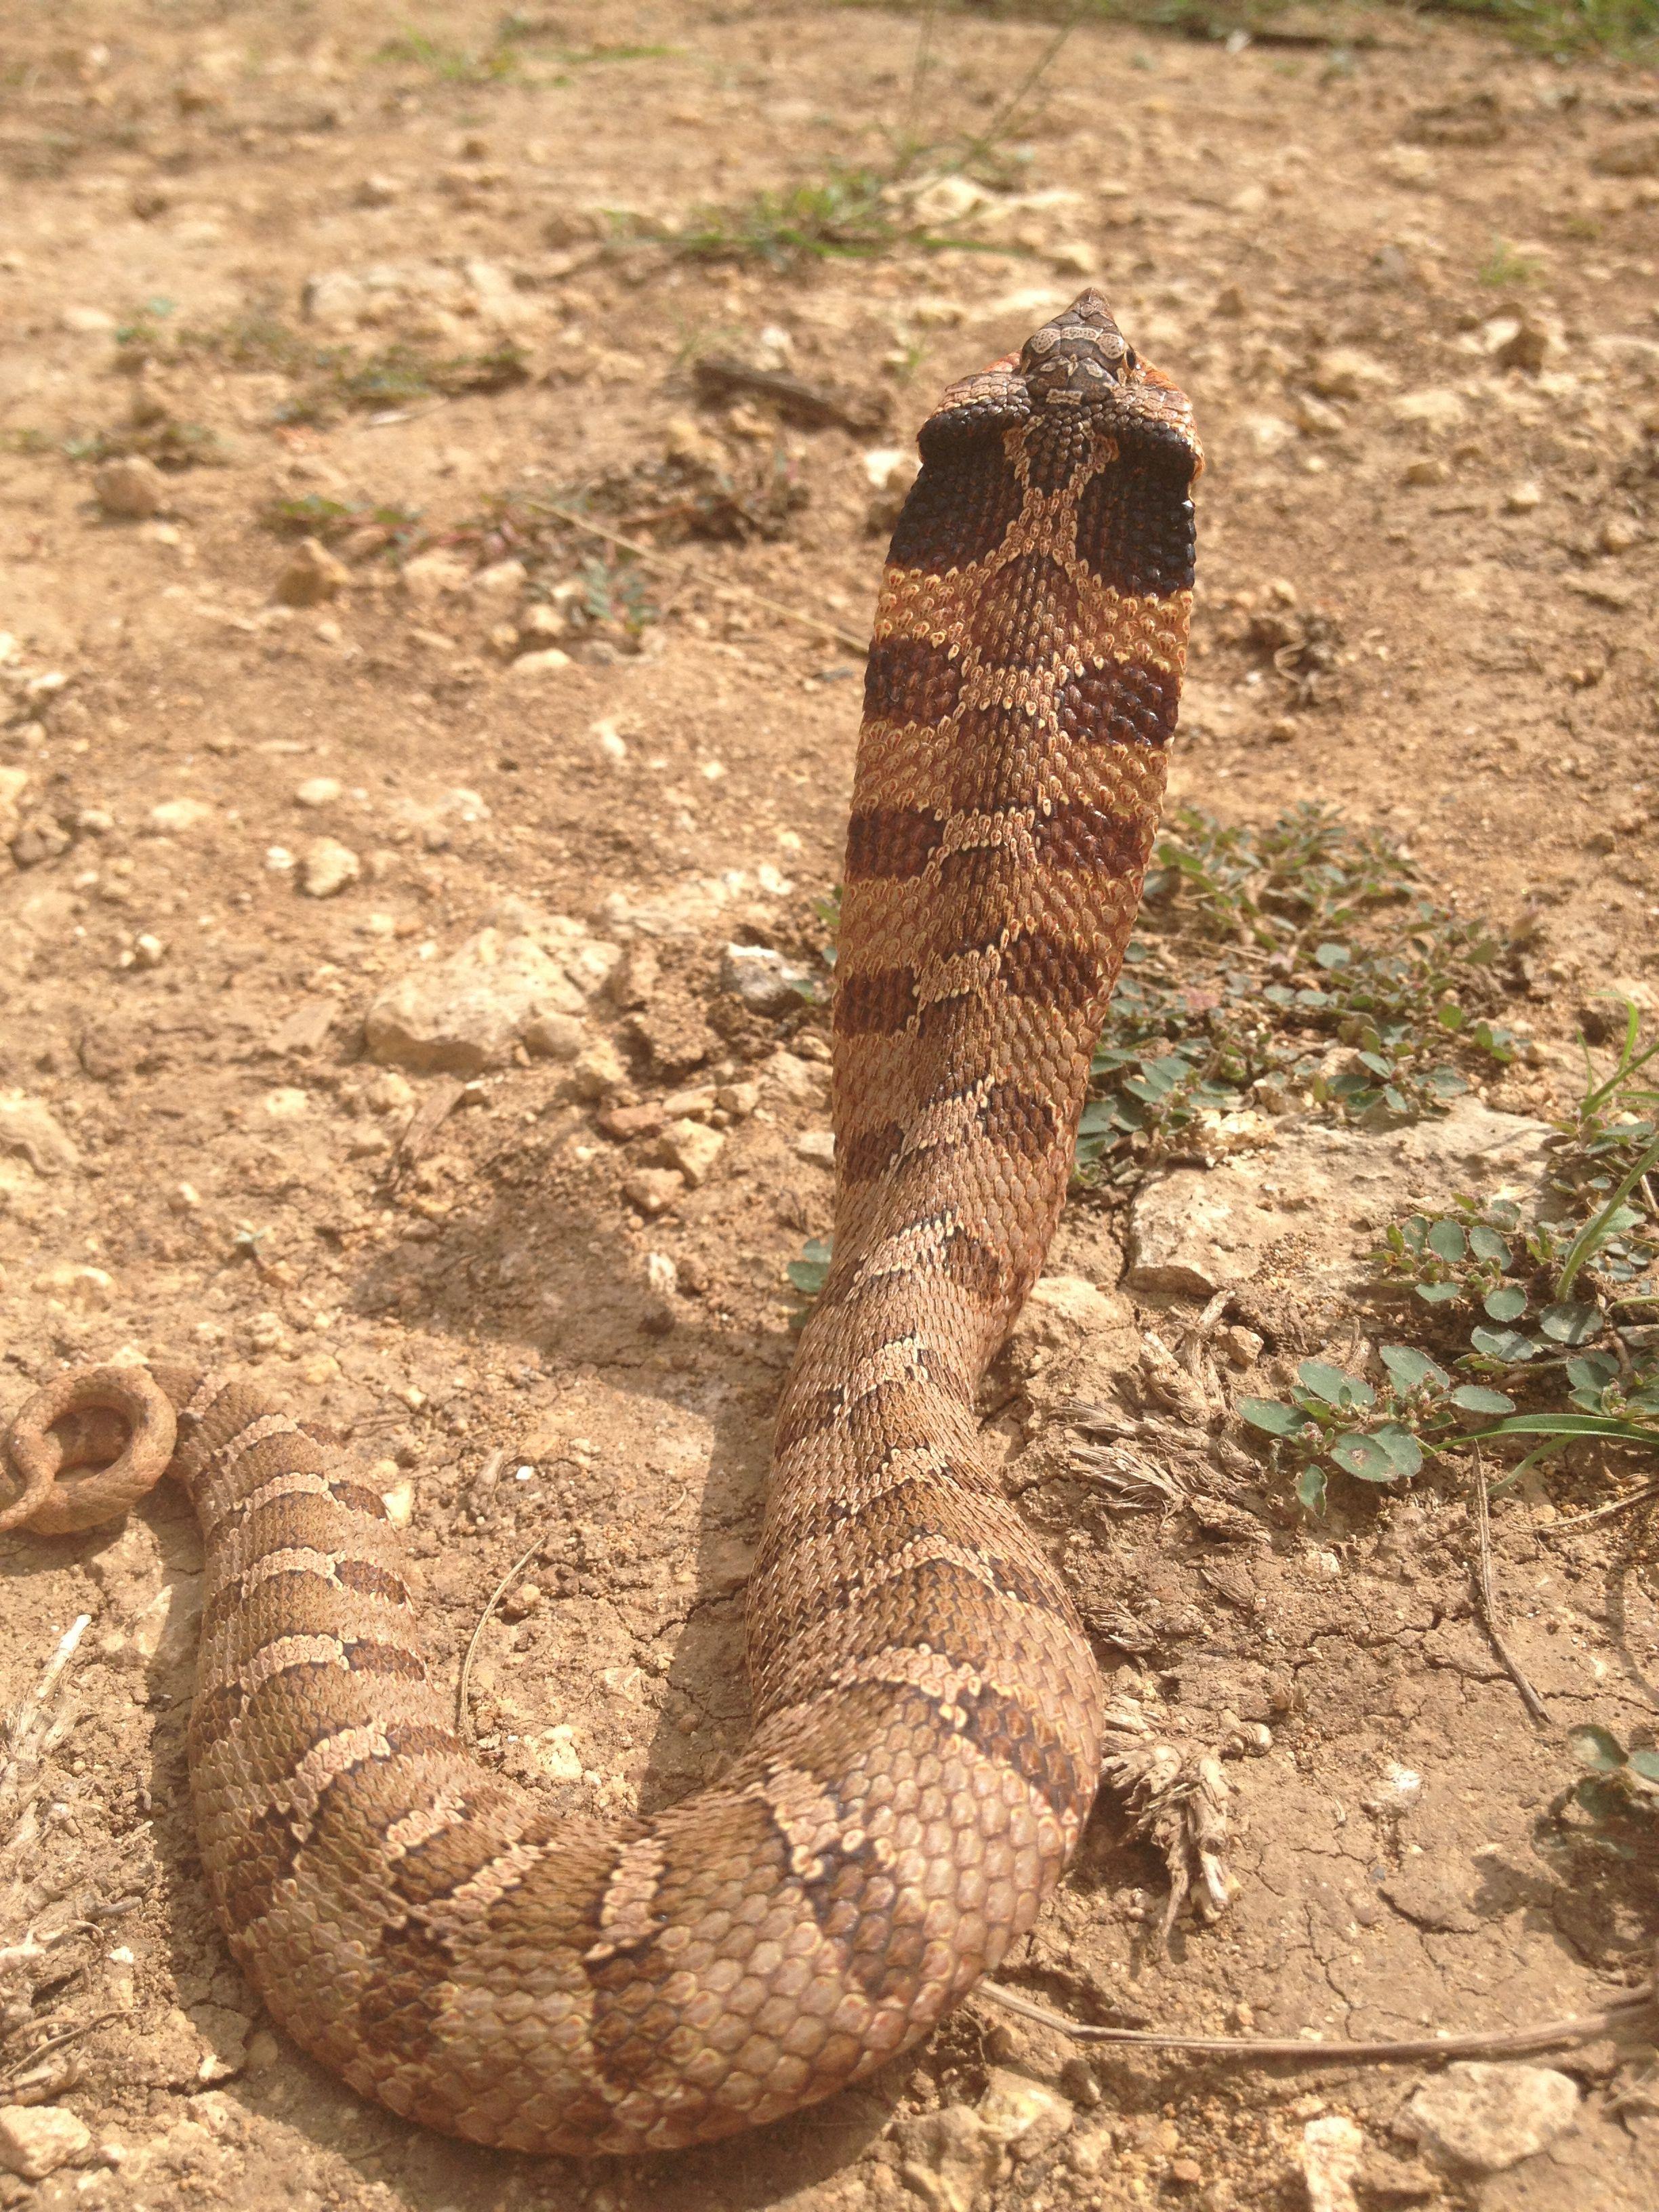 Pin By Enrique Roman On Reptiles Amphibians Hognose Snake Scary Snakes Snake